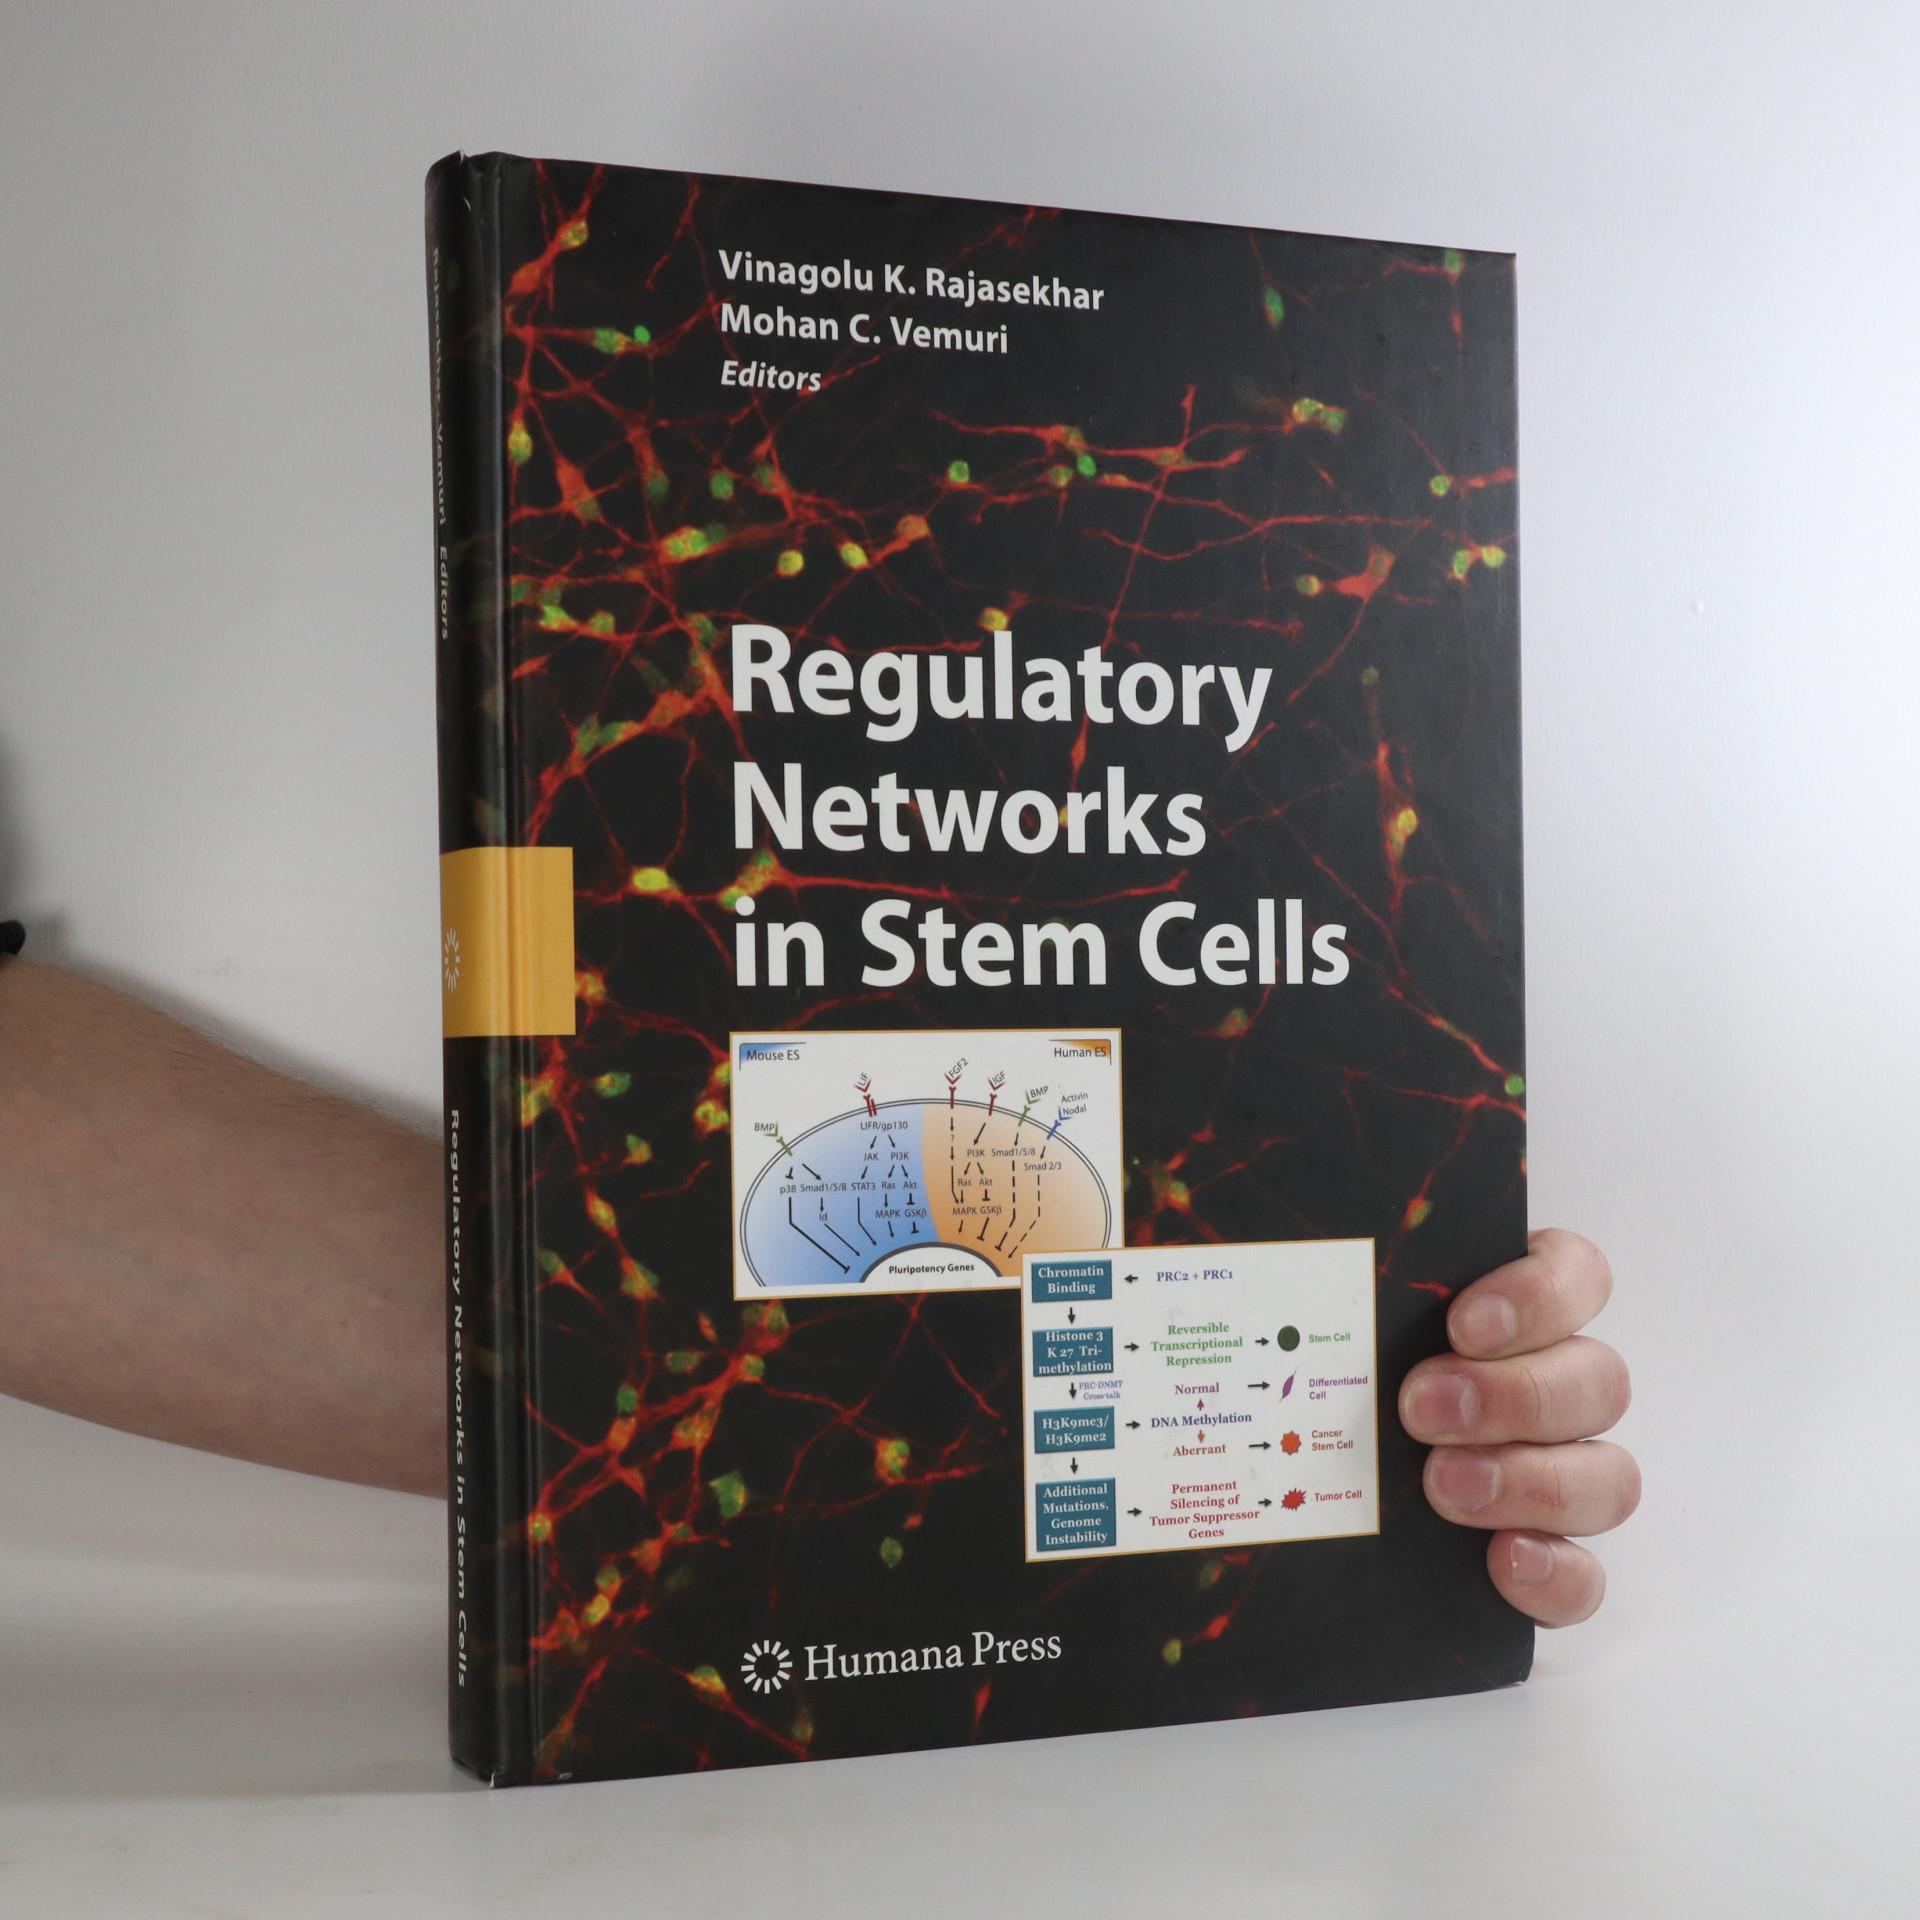 antikvární kniha Regulatory Networks in Stem Cells, neuveden